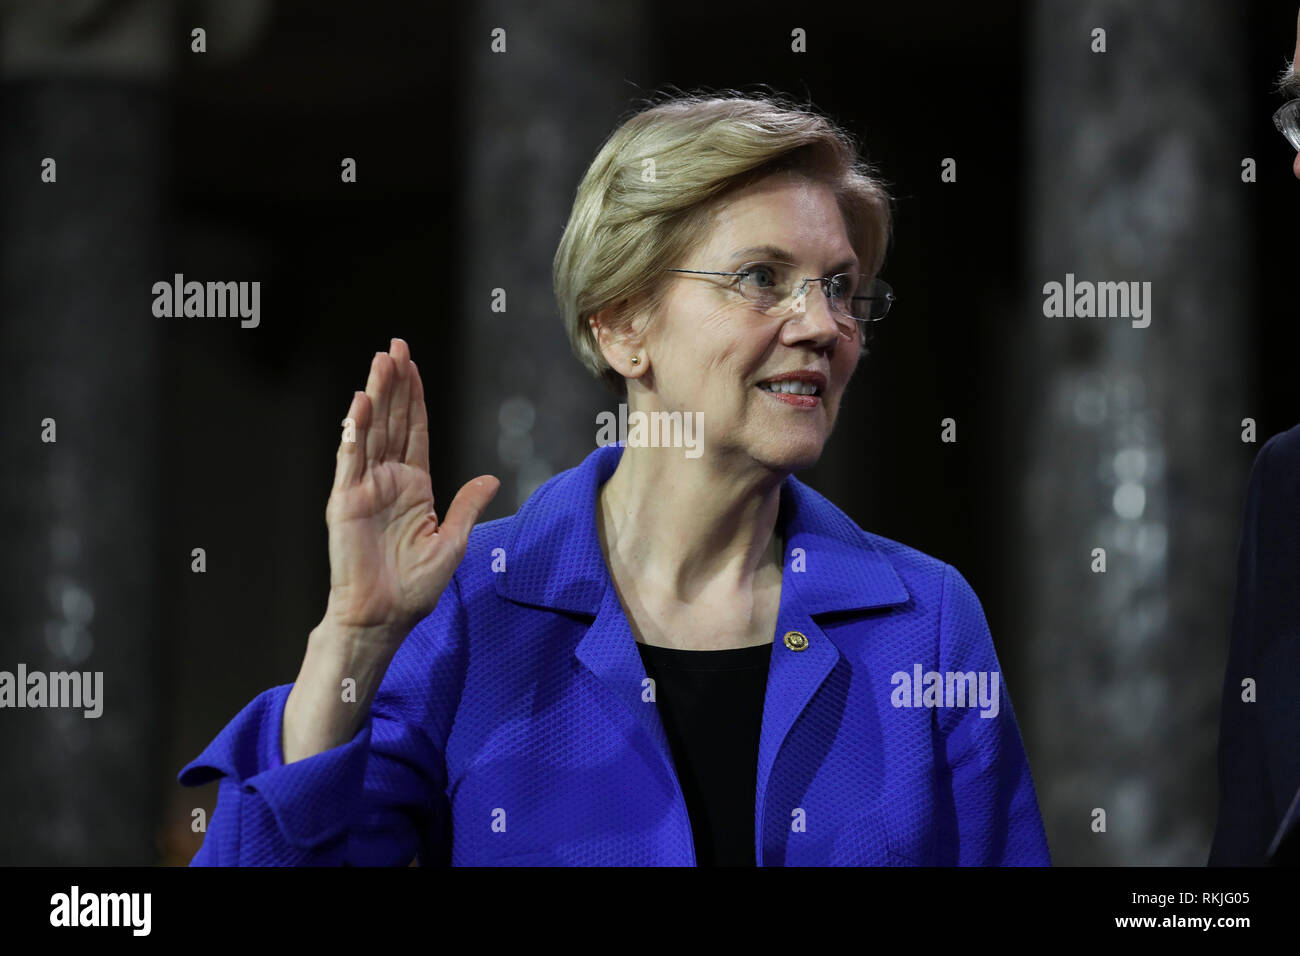 US Senator Elizabeth Warren, Democrat of Massachusetts, is sworn in by Vice President Mike Pence on Capitol Hill in Washington, DC on January 3, 2019. Stock Photo